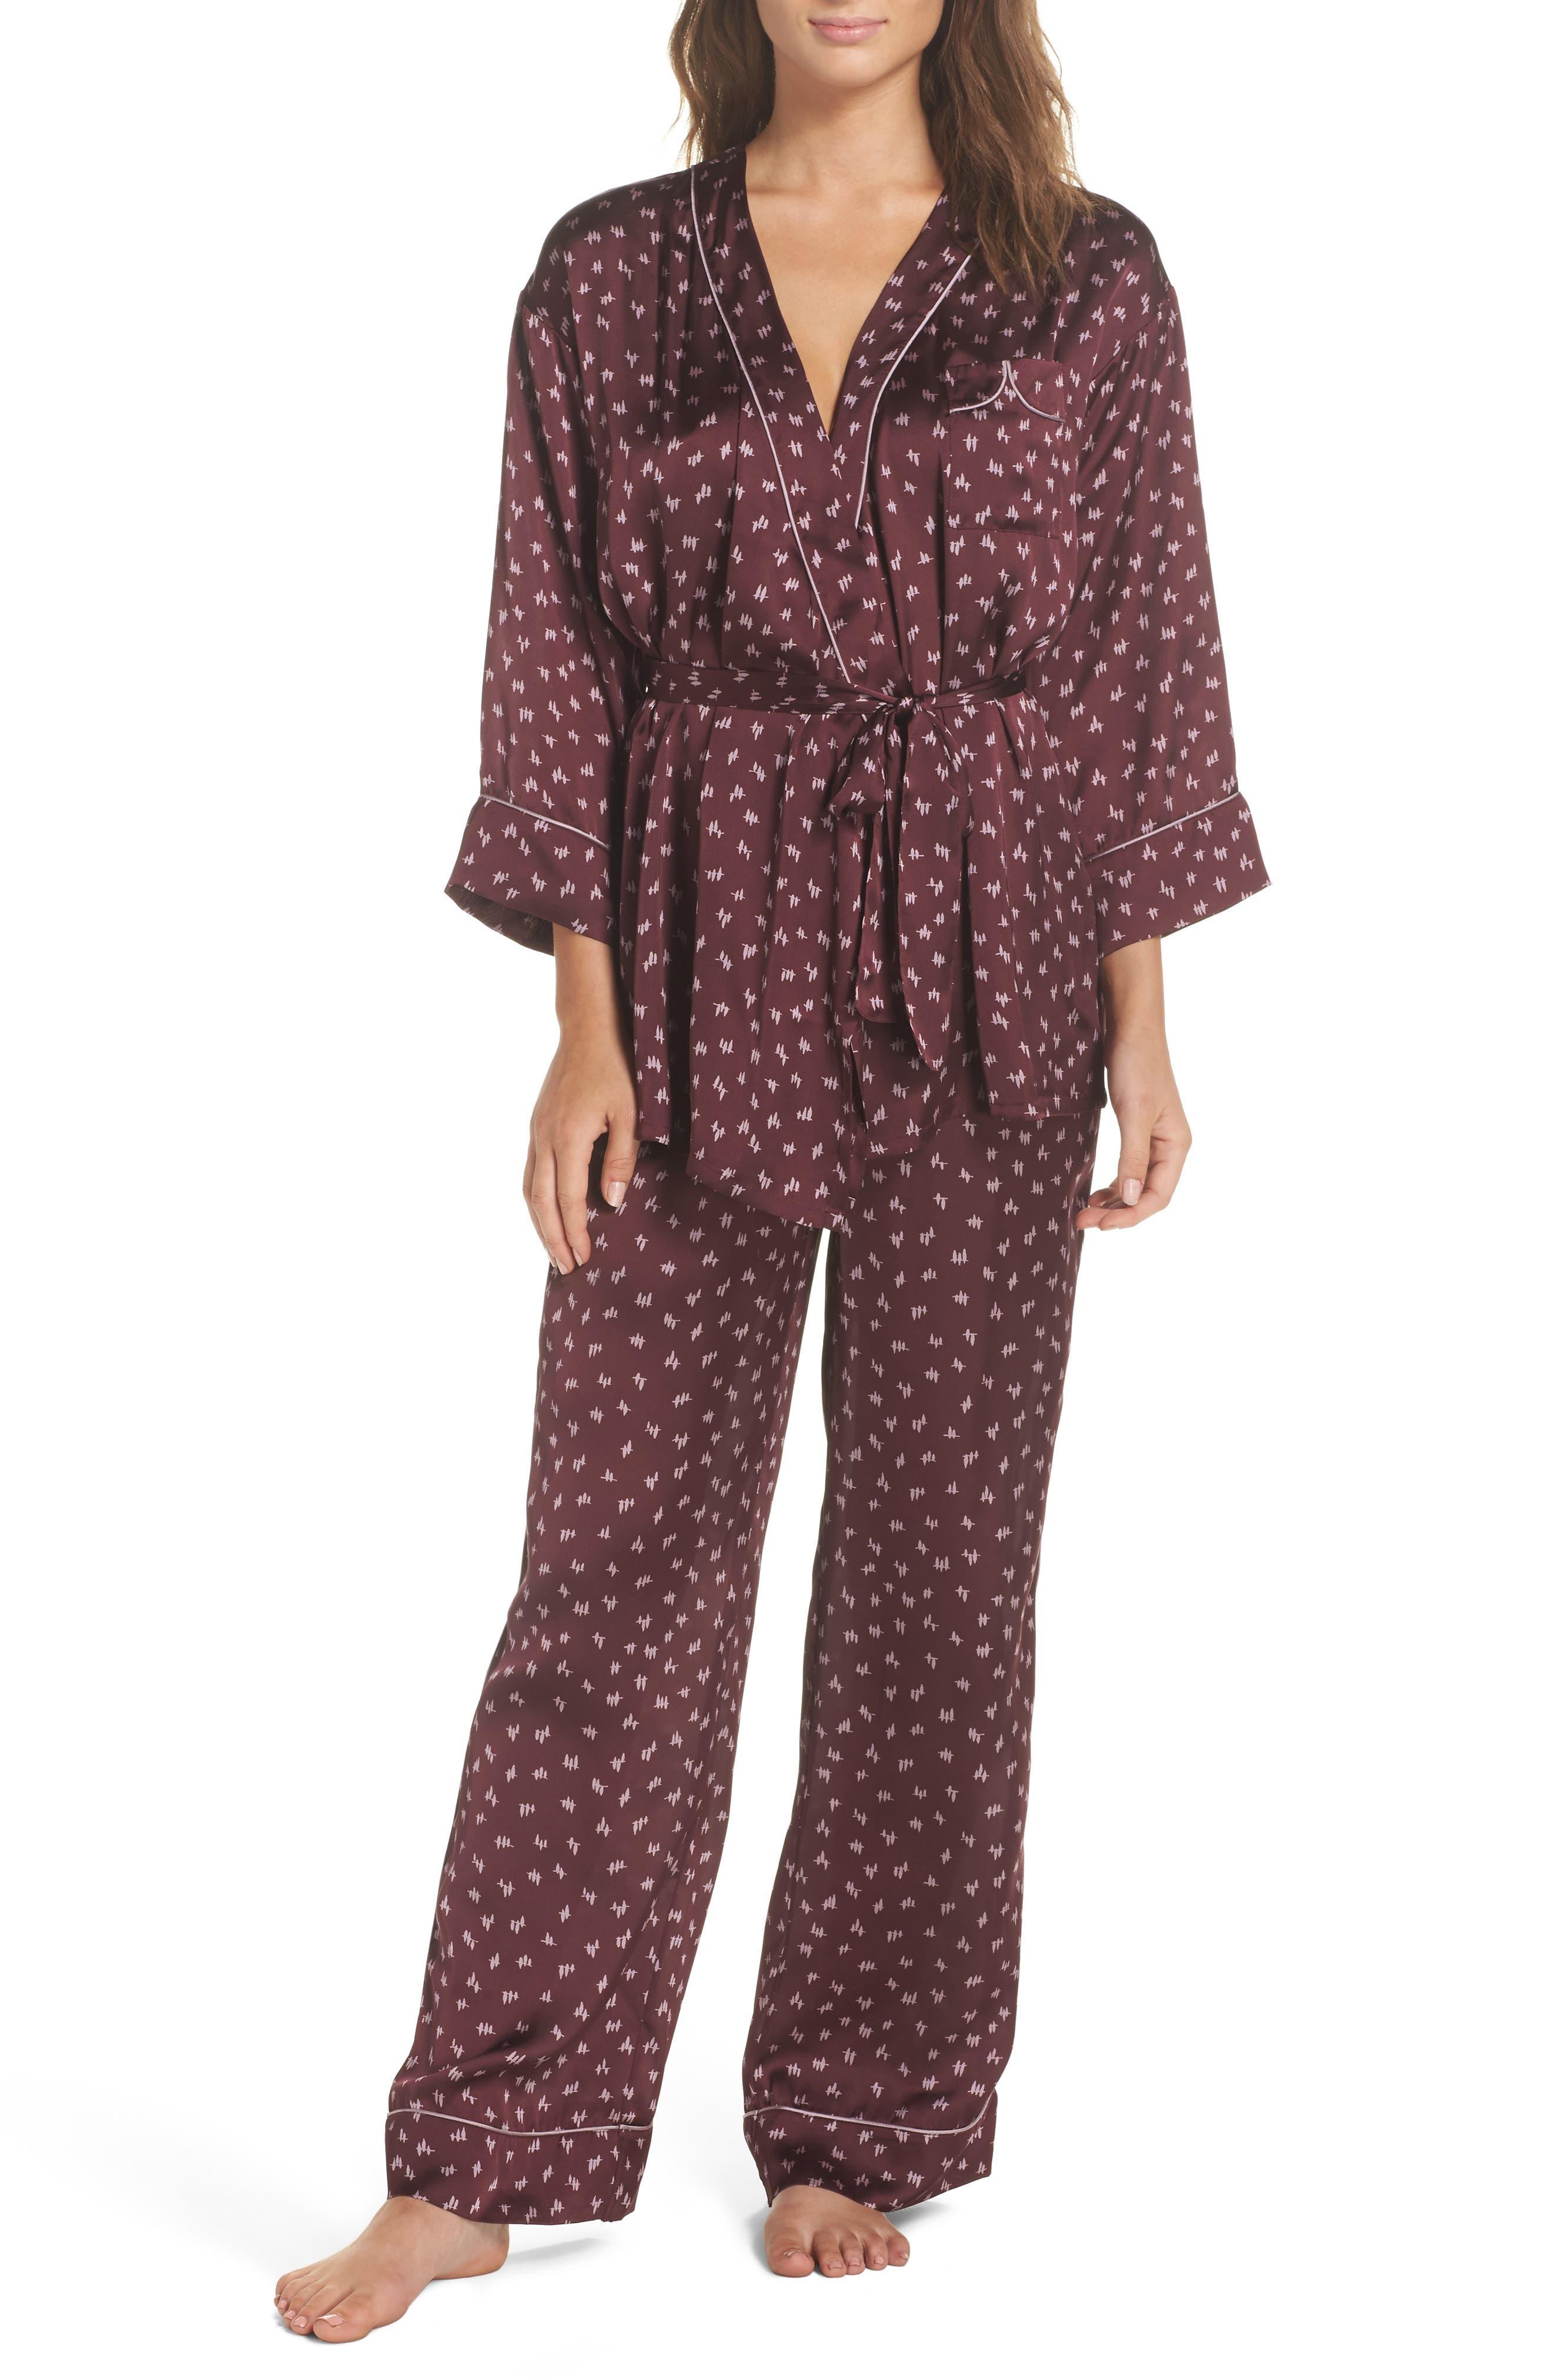 Wrap Satin Pajamas,                             Main thumbnail 1, color,                             930